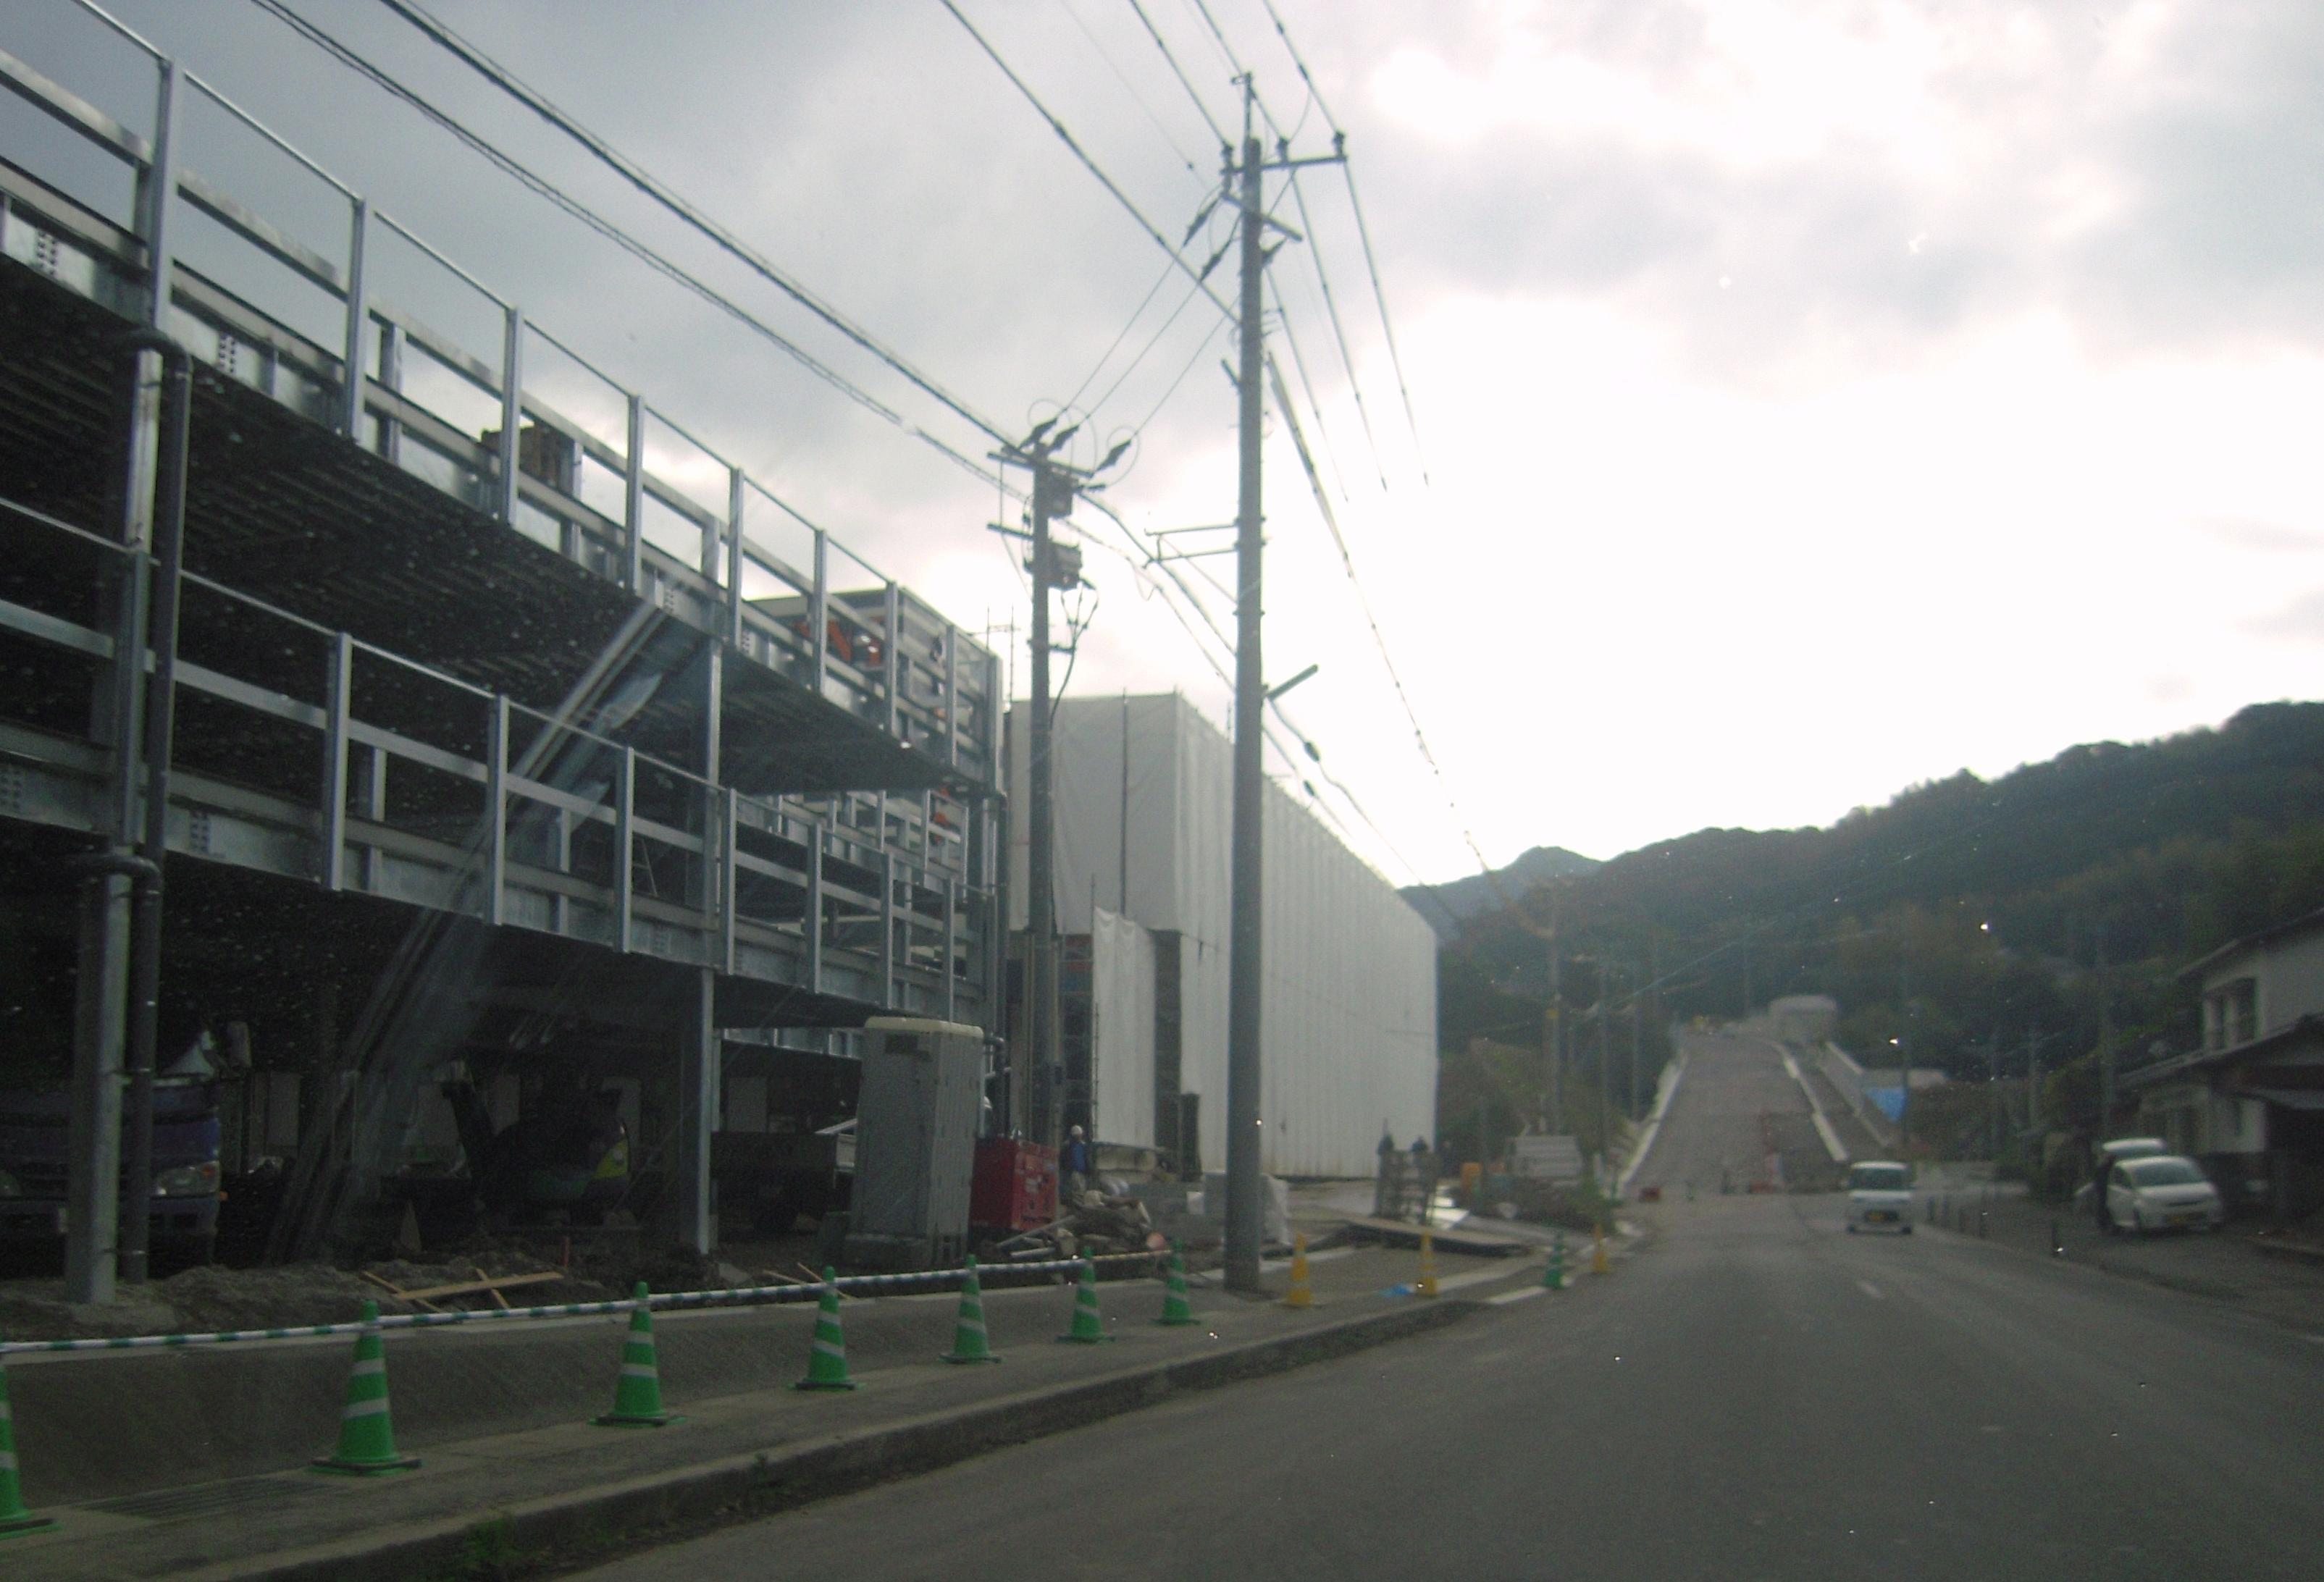 P-ZONE松浦店-12月7日工事状況-3